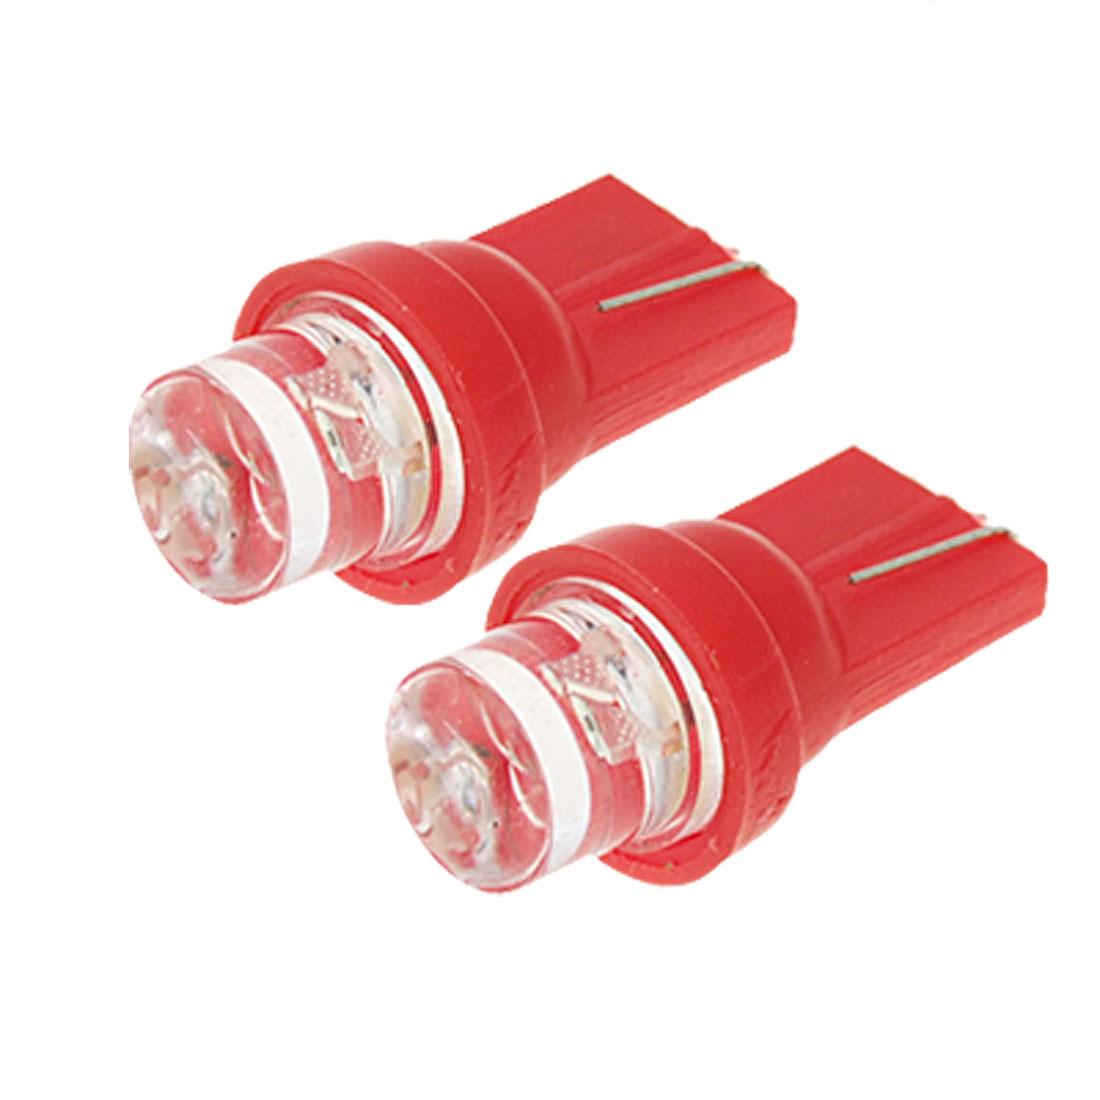 Unique Bargains T10 Bright Red Light Mini 12V Car Auto Lamp Bulb 2PCS